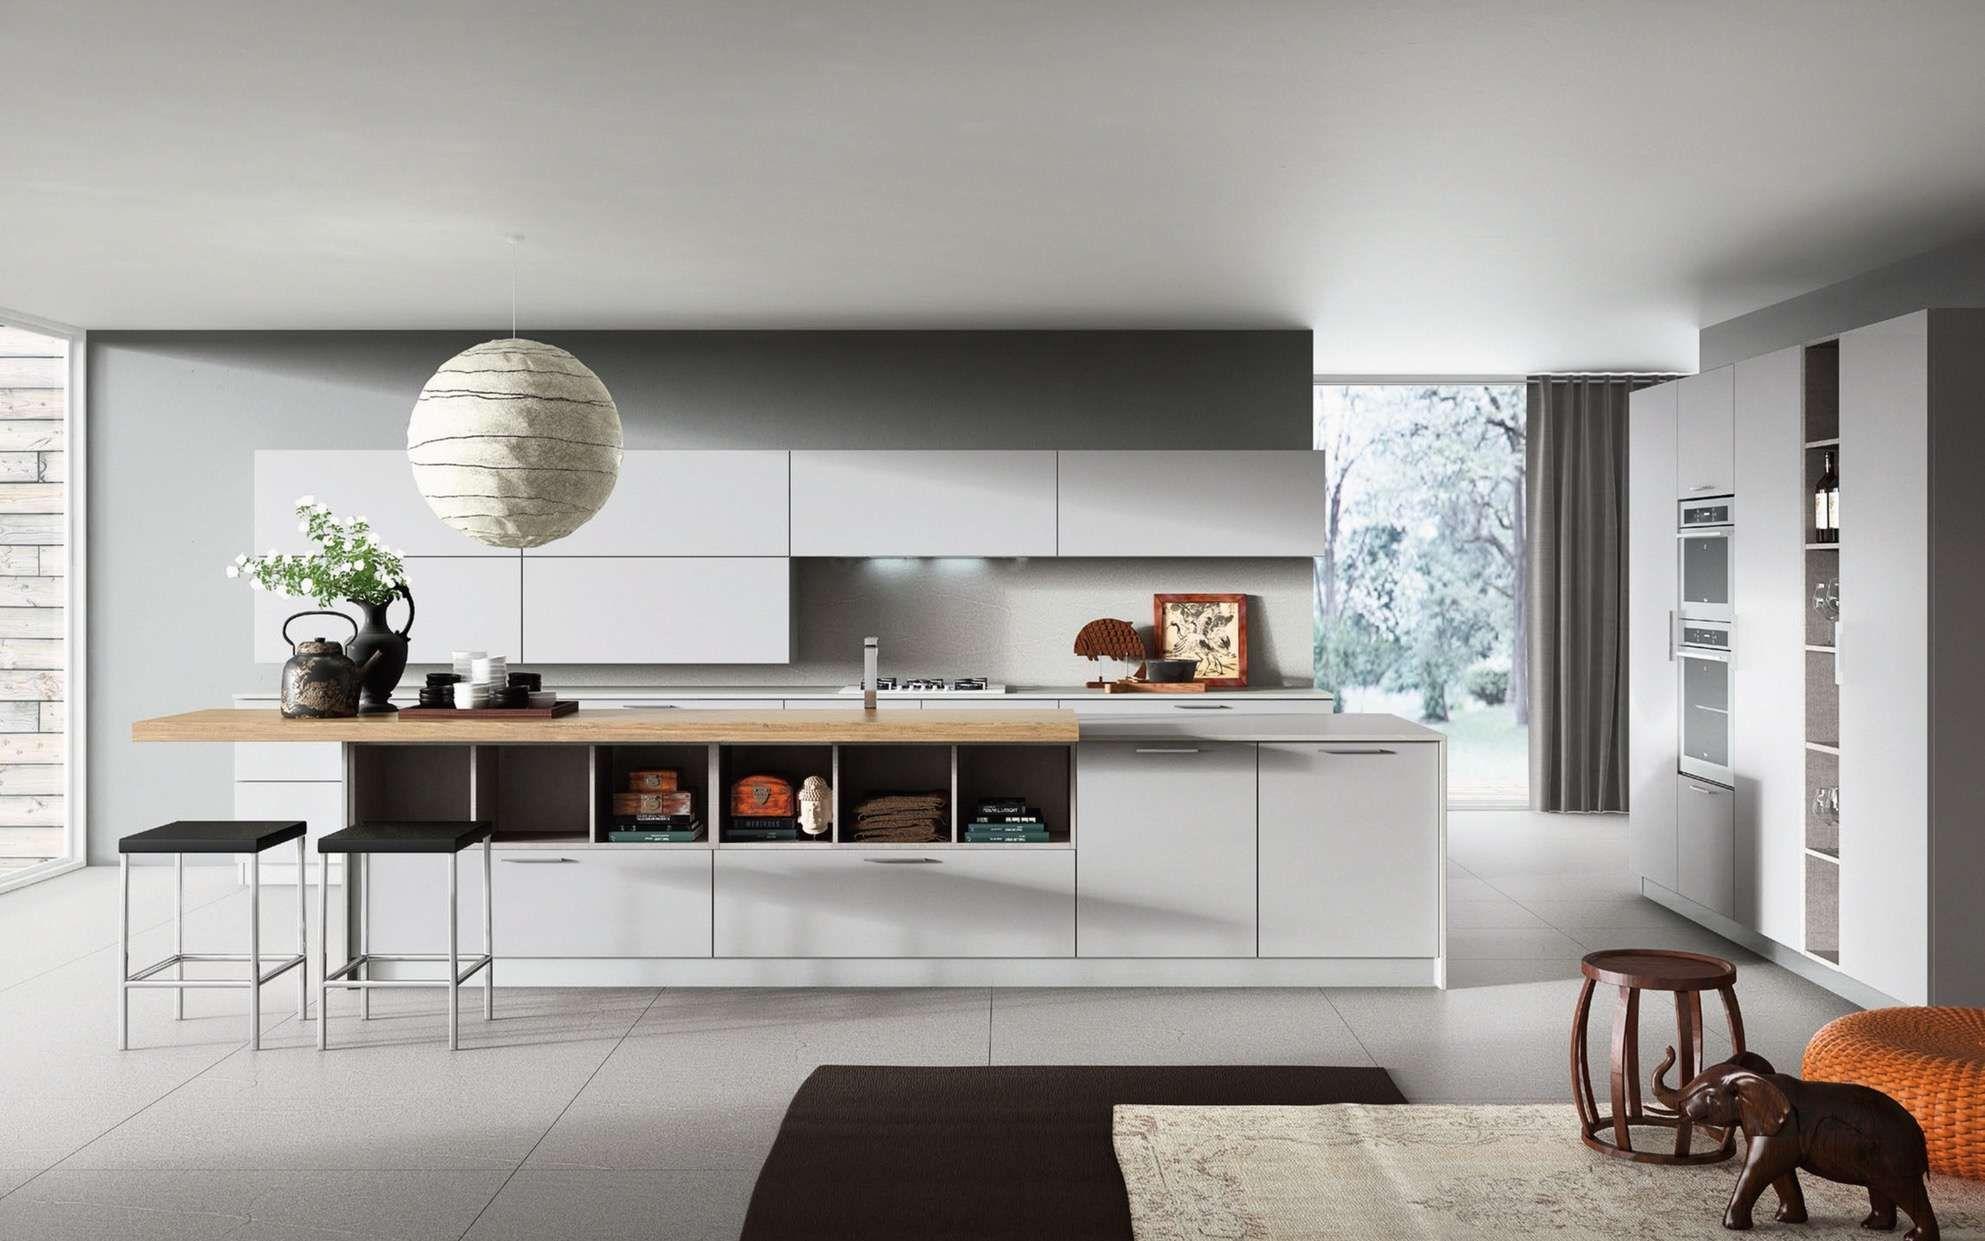 armony residence kitchen fun in 2019 kitchen modern kitchen rh pinterest com